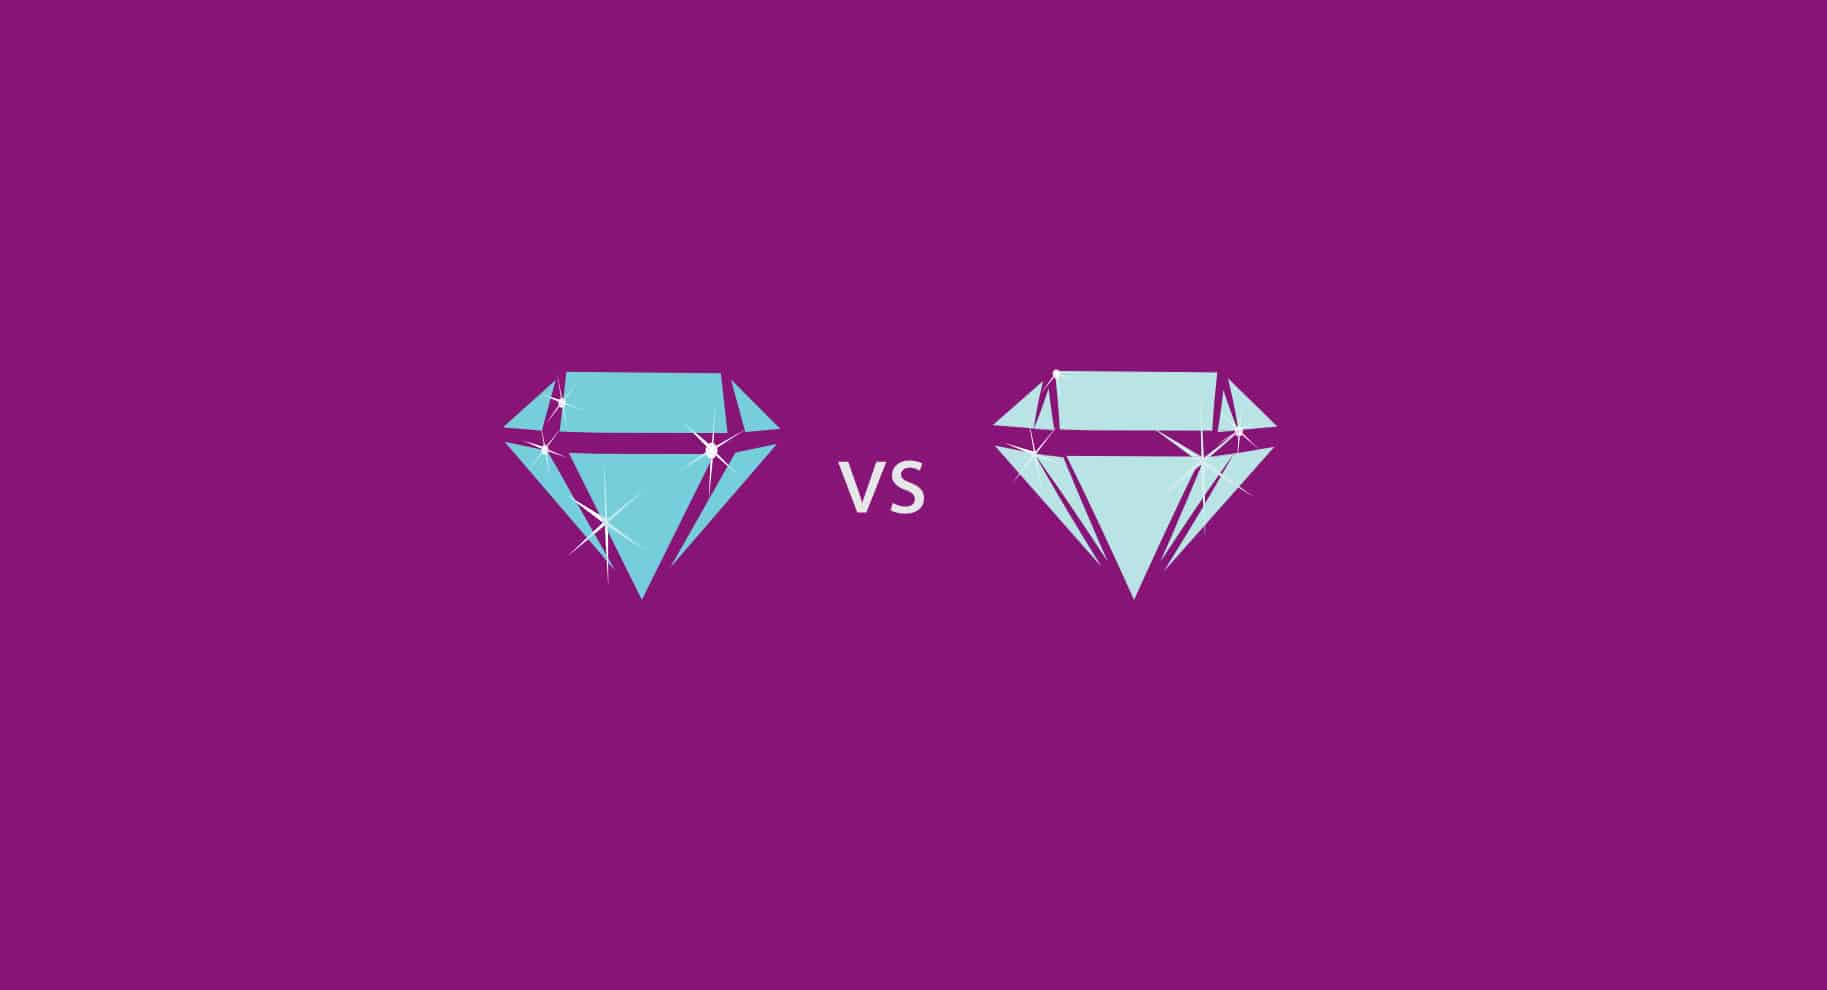 Moissanite vs Diamonds illustration